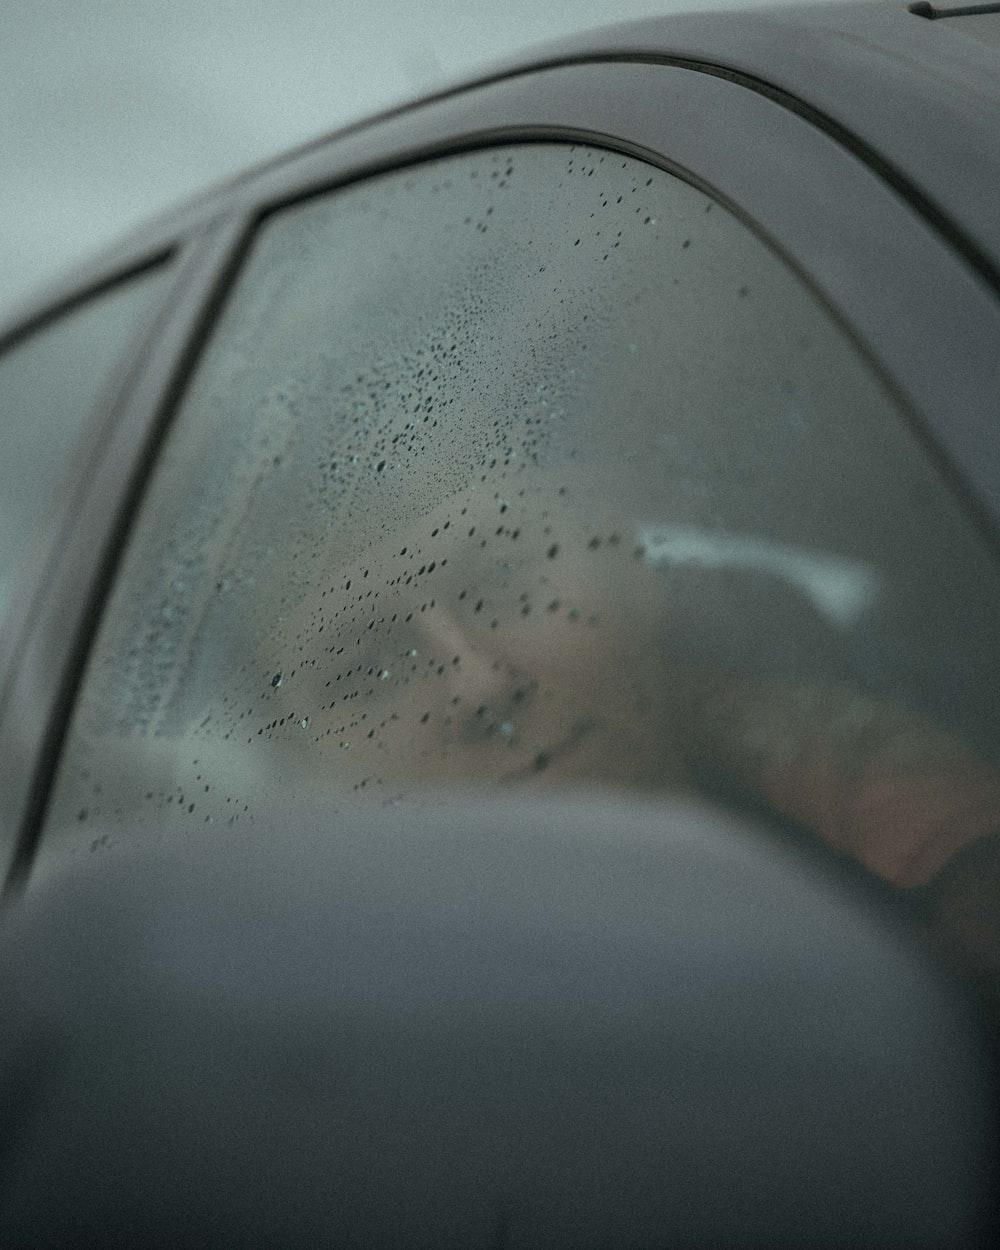 person in car side mirror